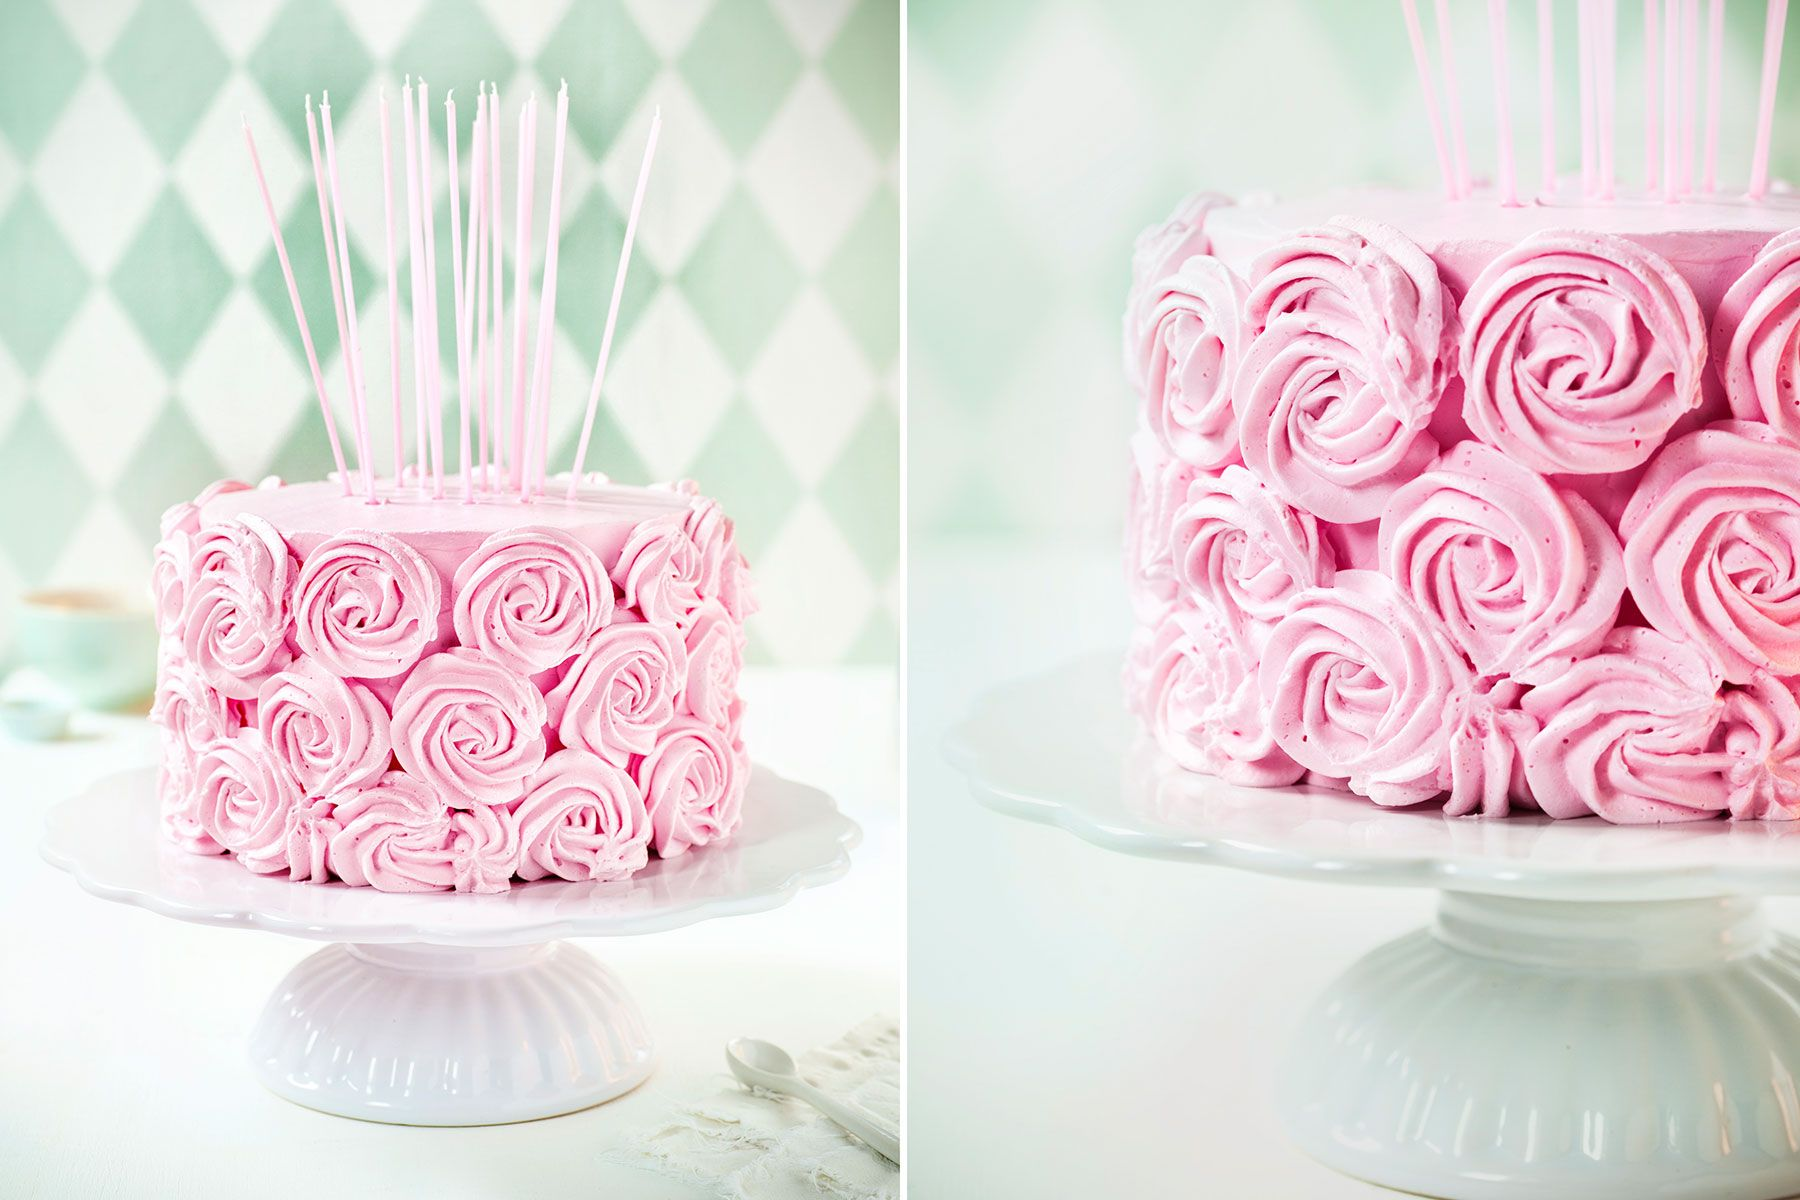 Happy Birthday Ronnie Cake Images